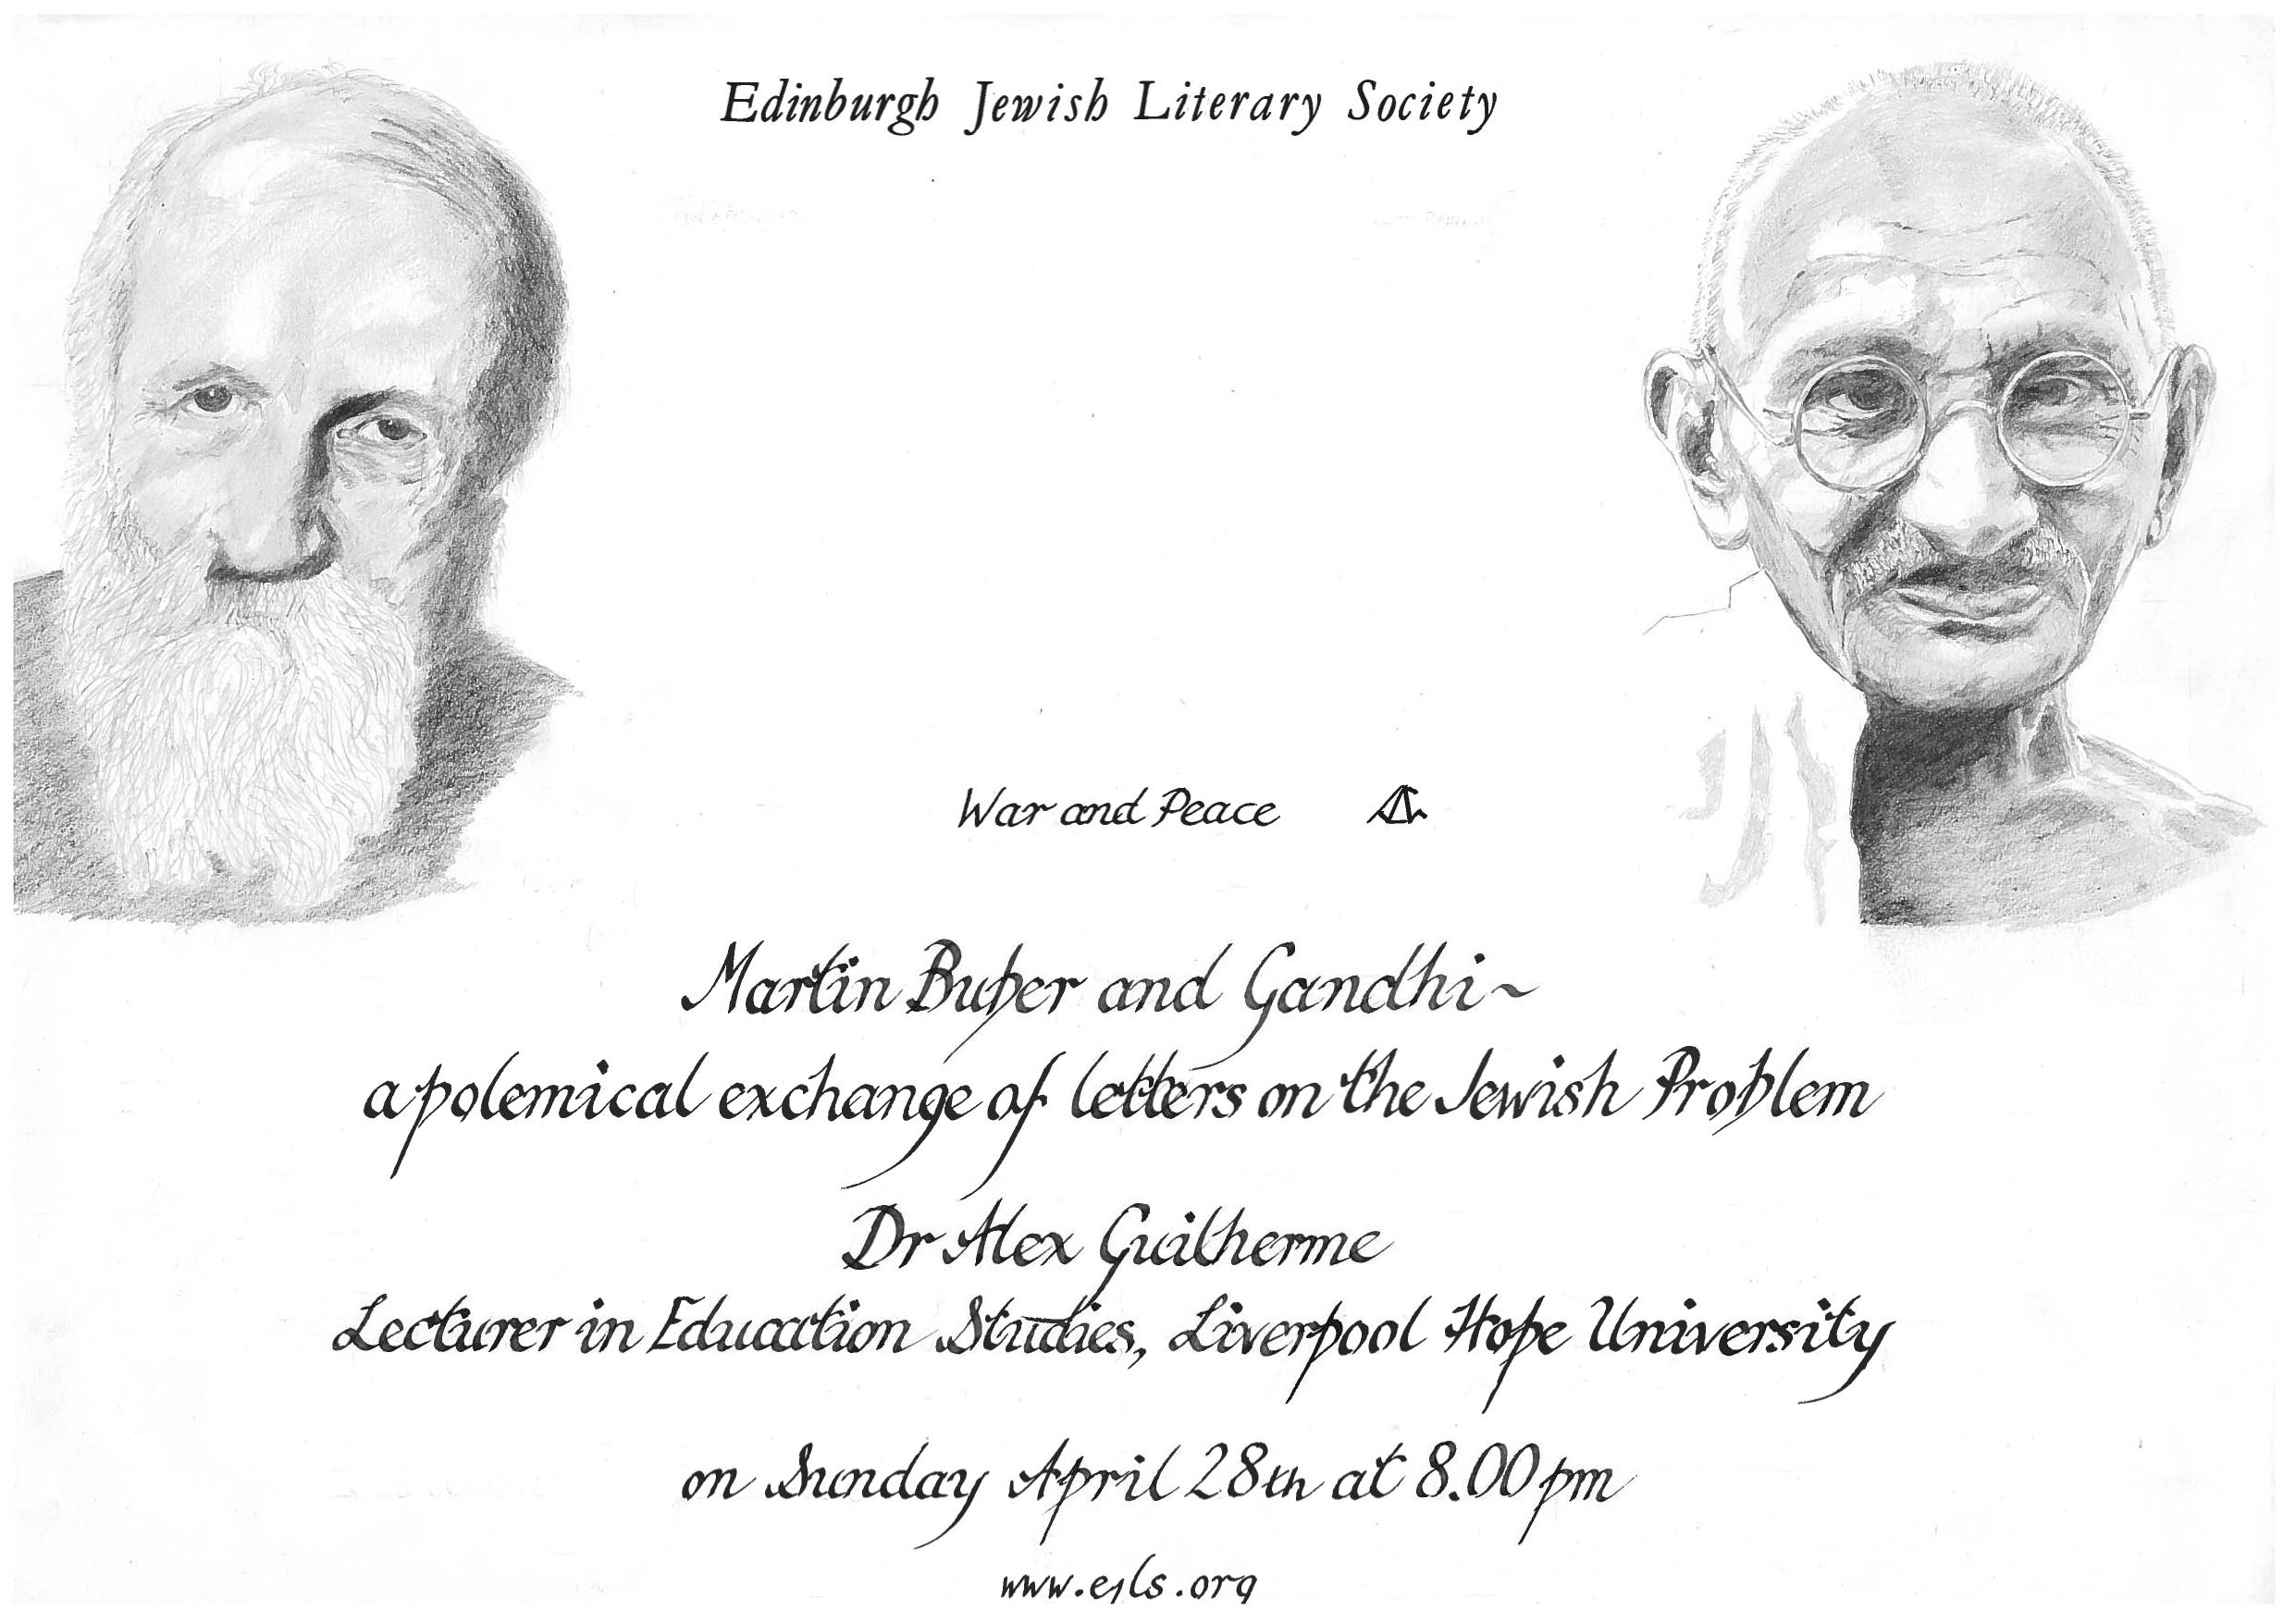 Who was Martin Buber?